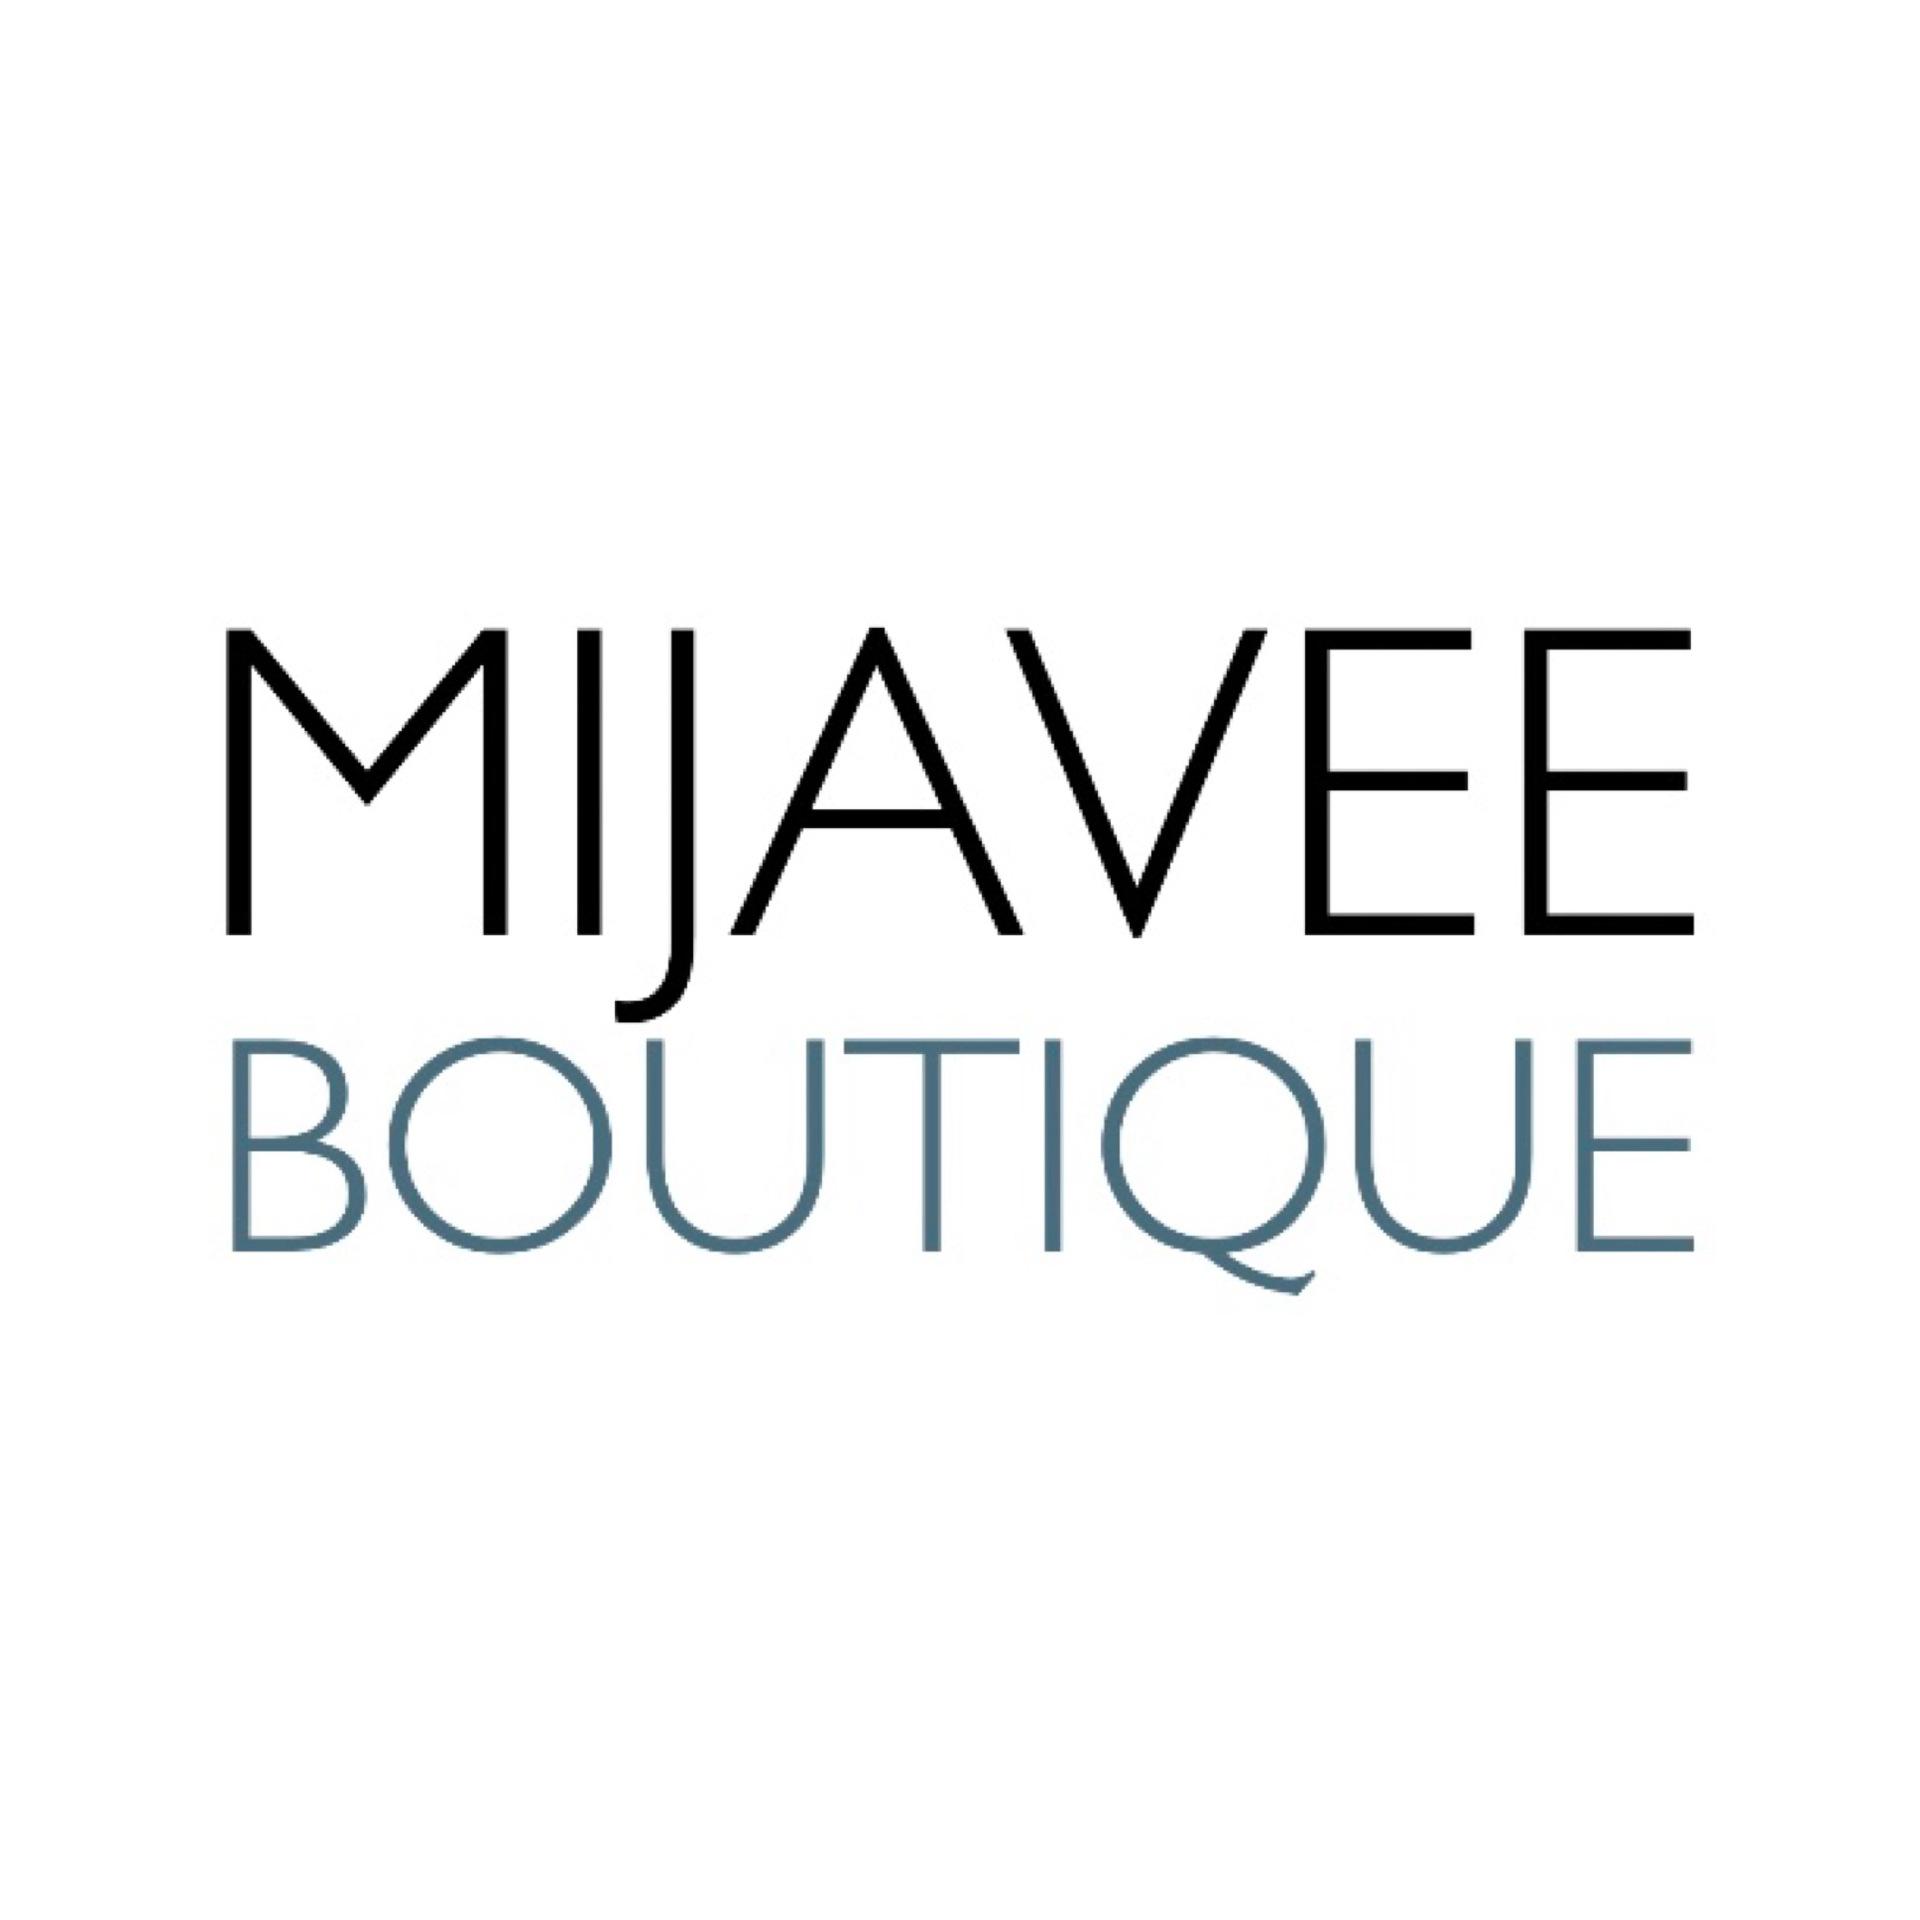 Mijavee Boutique  Store